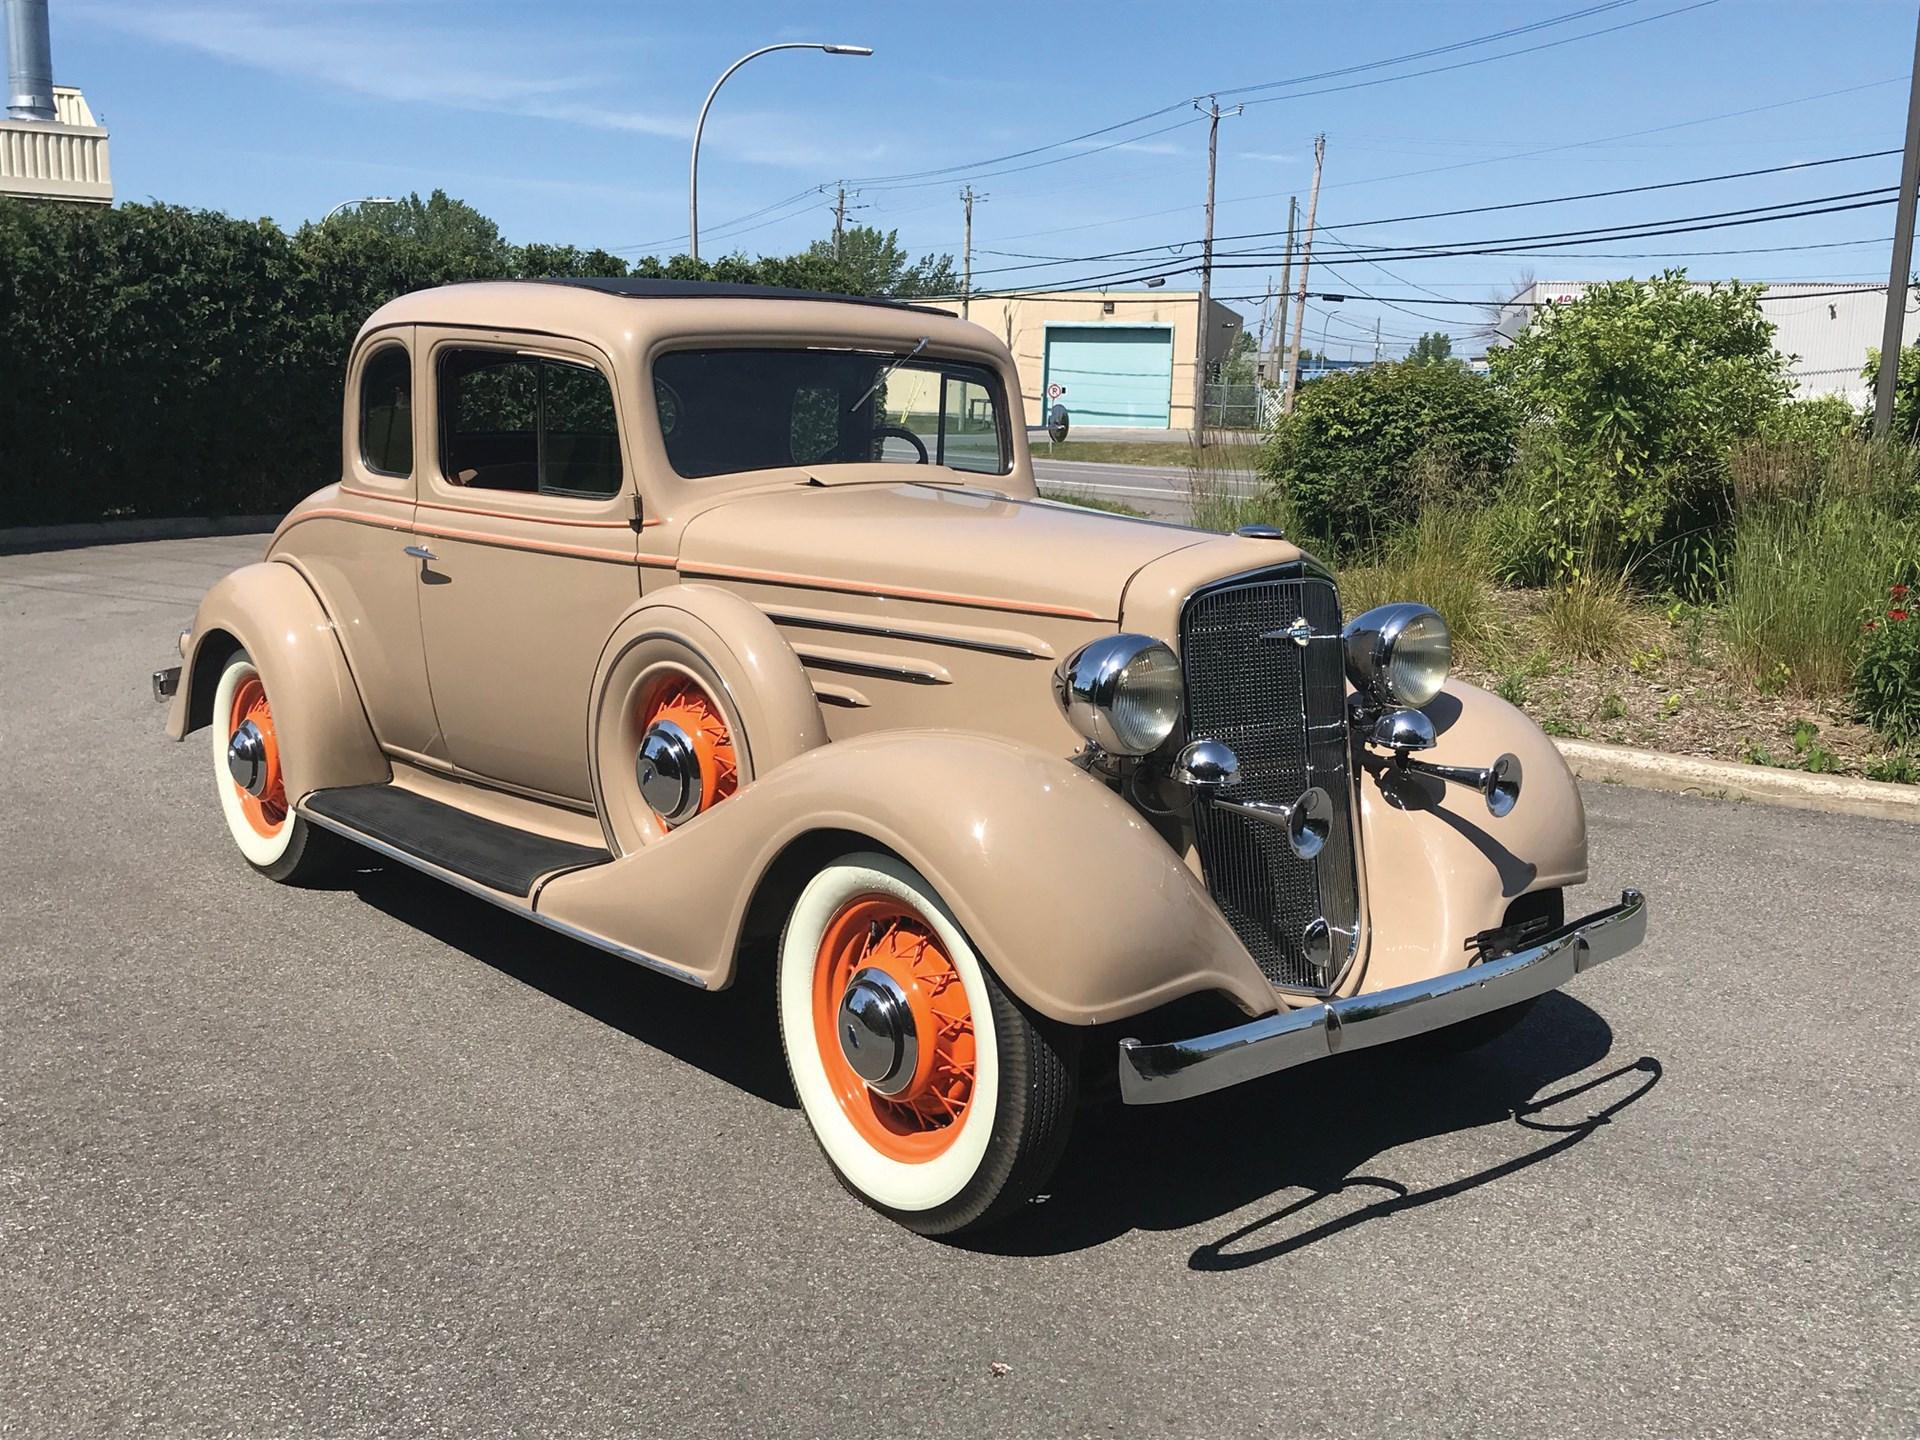 RM Sotheby's - 1934 Chevrolet Master | Auburn Fall 2019